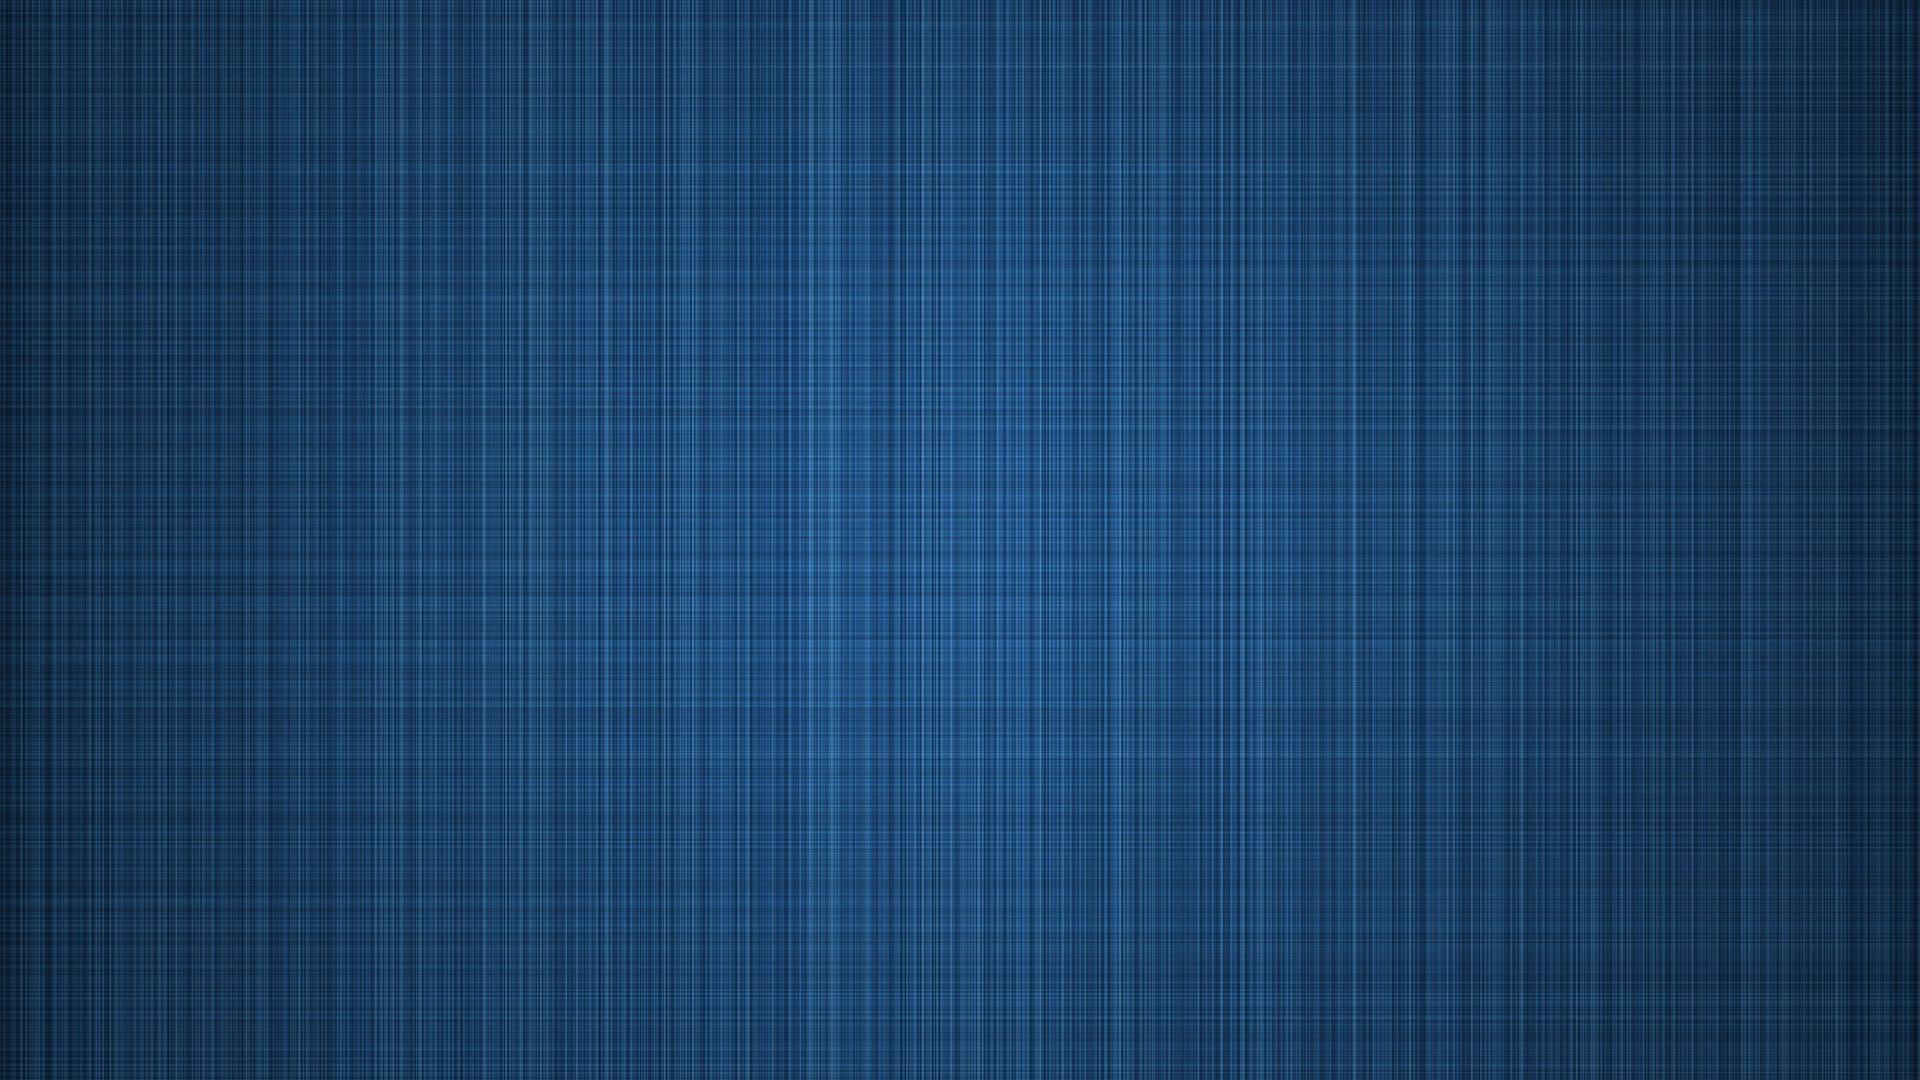 Vr79-linen-blue-abstract-pattern-wallpaper